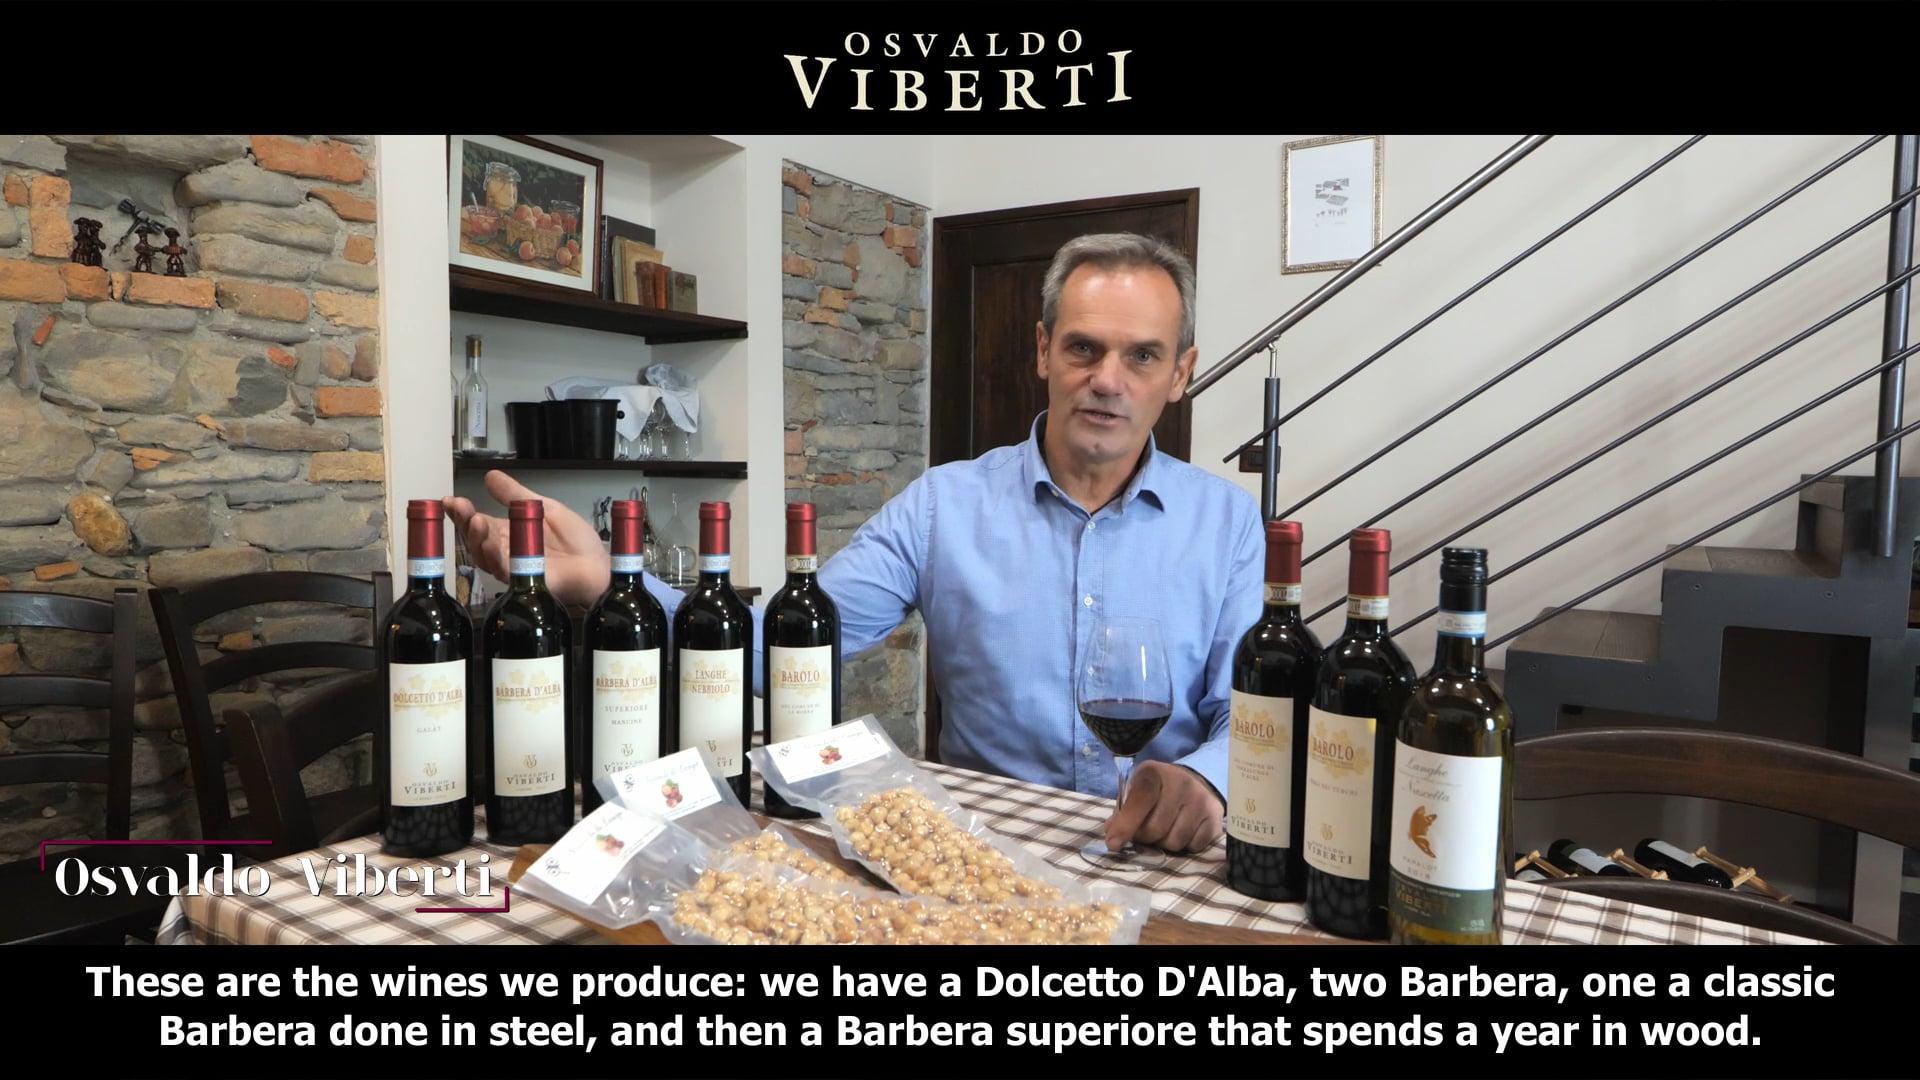 I nostri vini | Our Wines